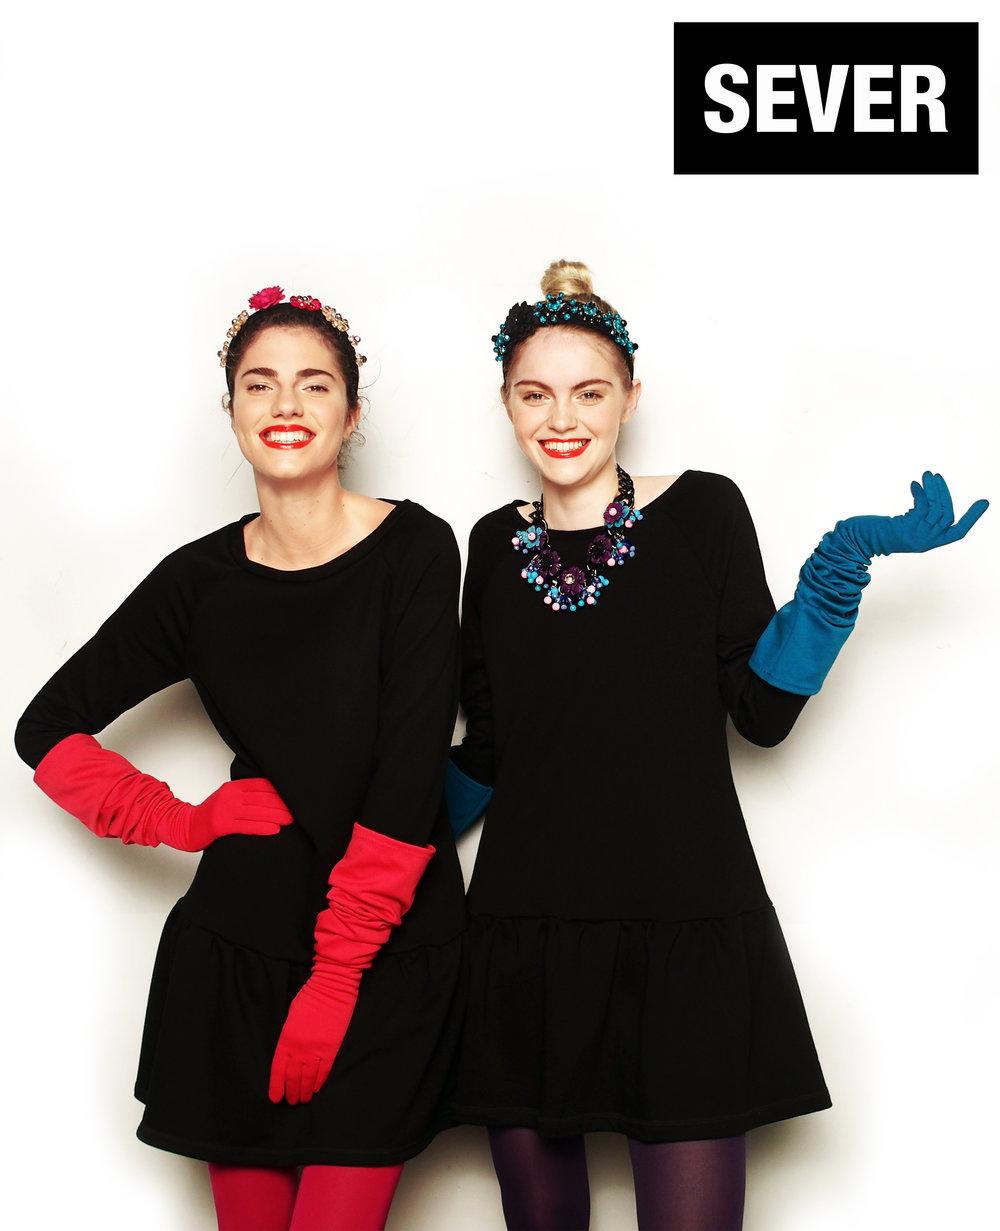 robert-sever-streetwear-kolekcija-2016 (3).jpg